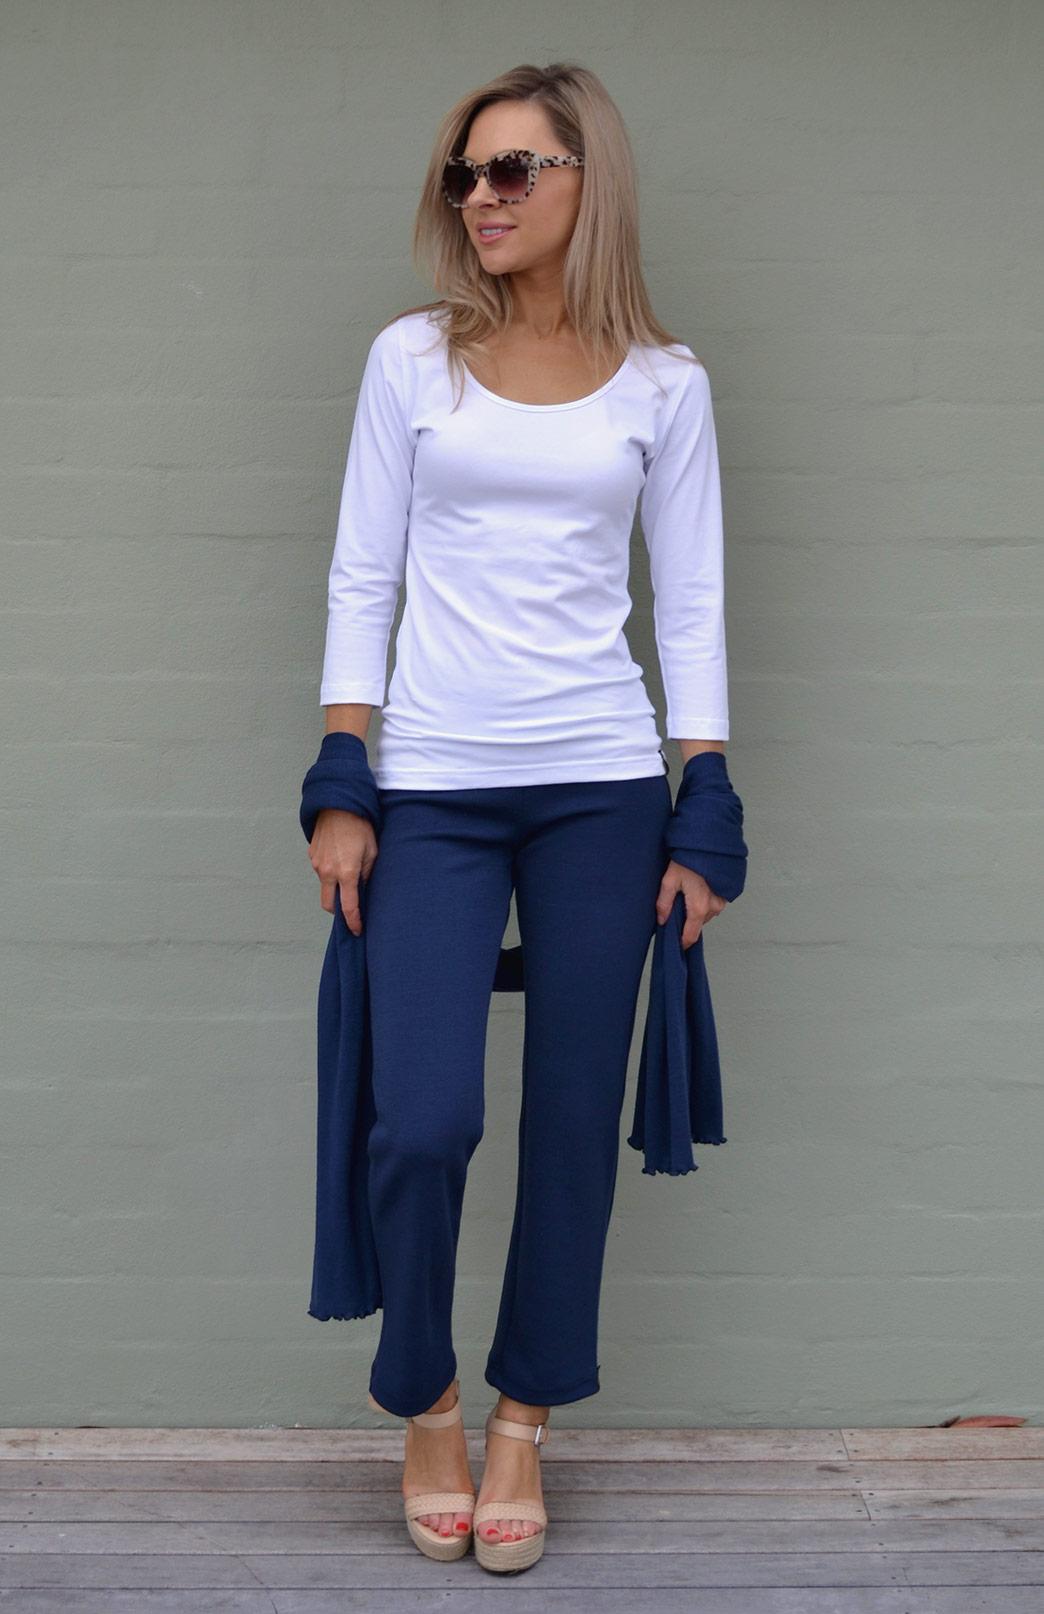 Sienna Top - Women's White Organic Cotton 3/4 Sleeved Scoop Neck Top with Fitted Body - Smitten Merino Tasmania Australia